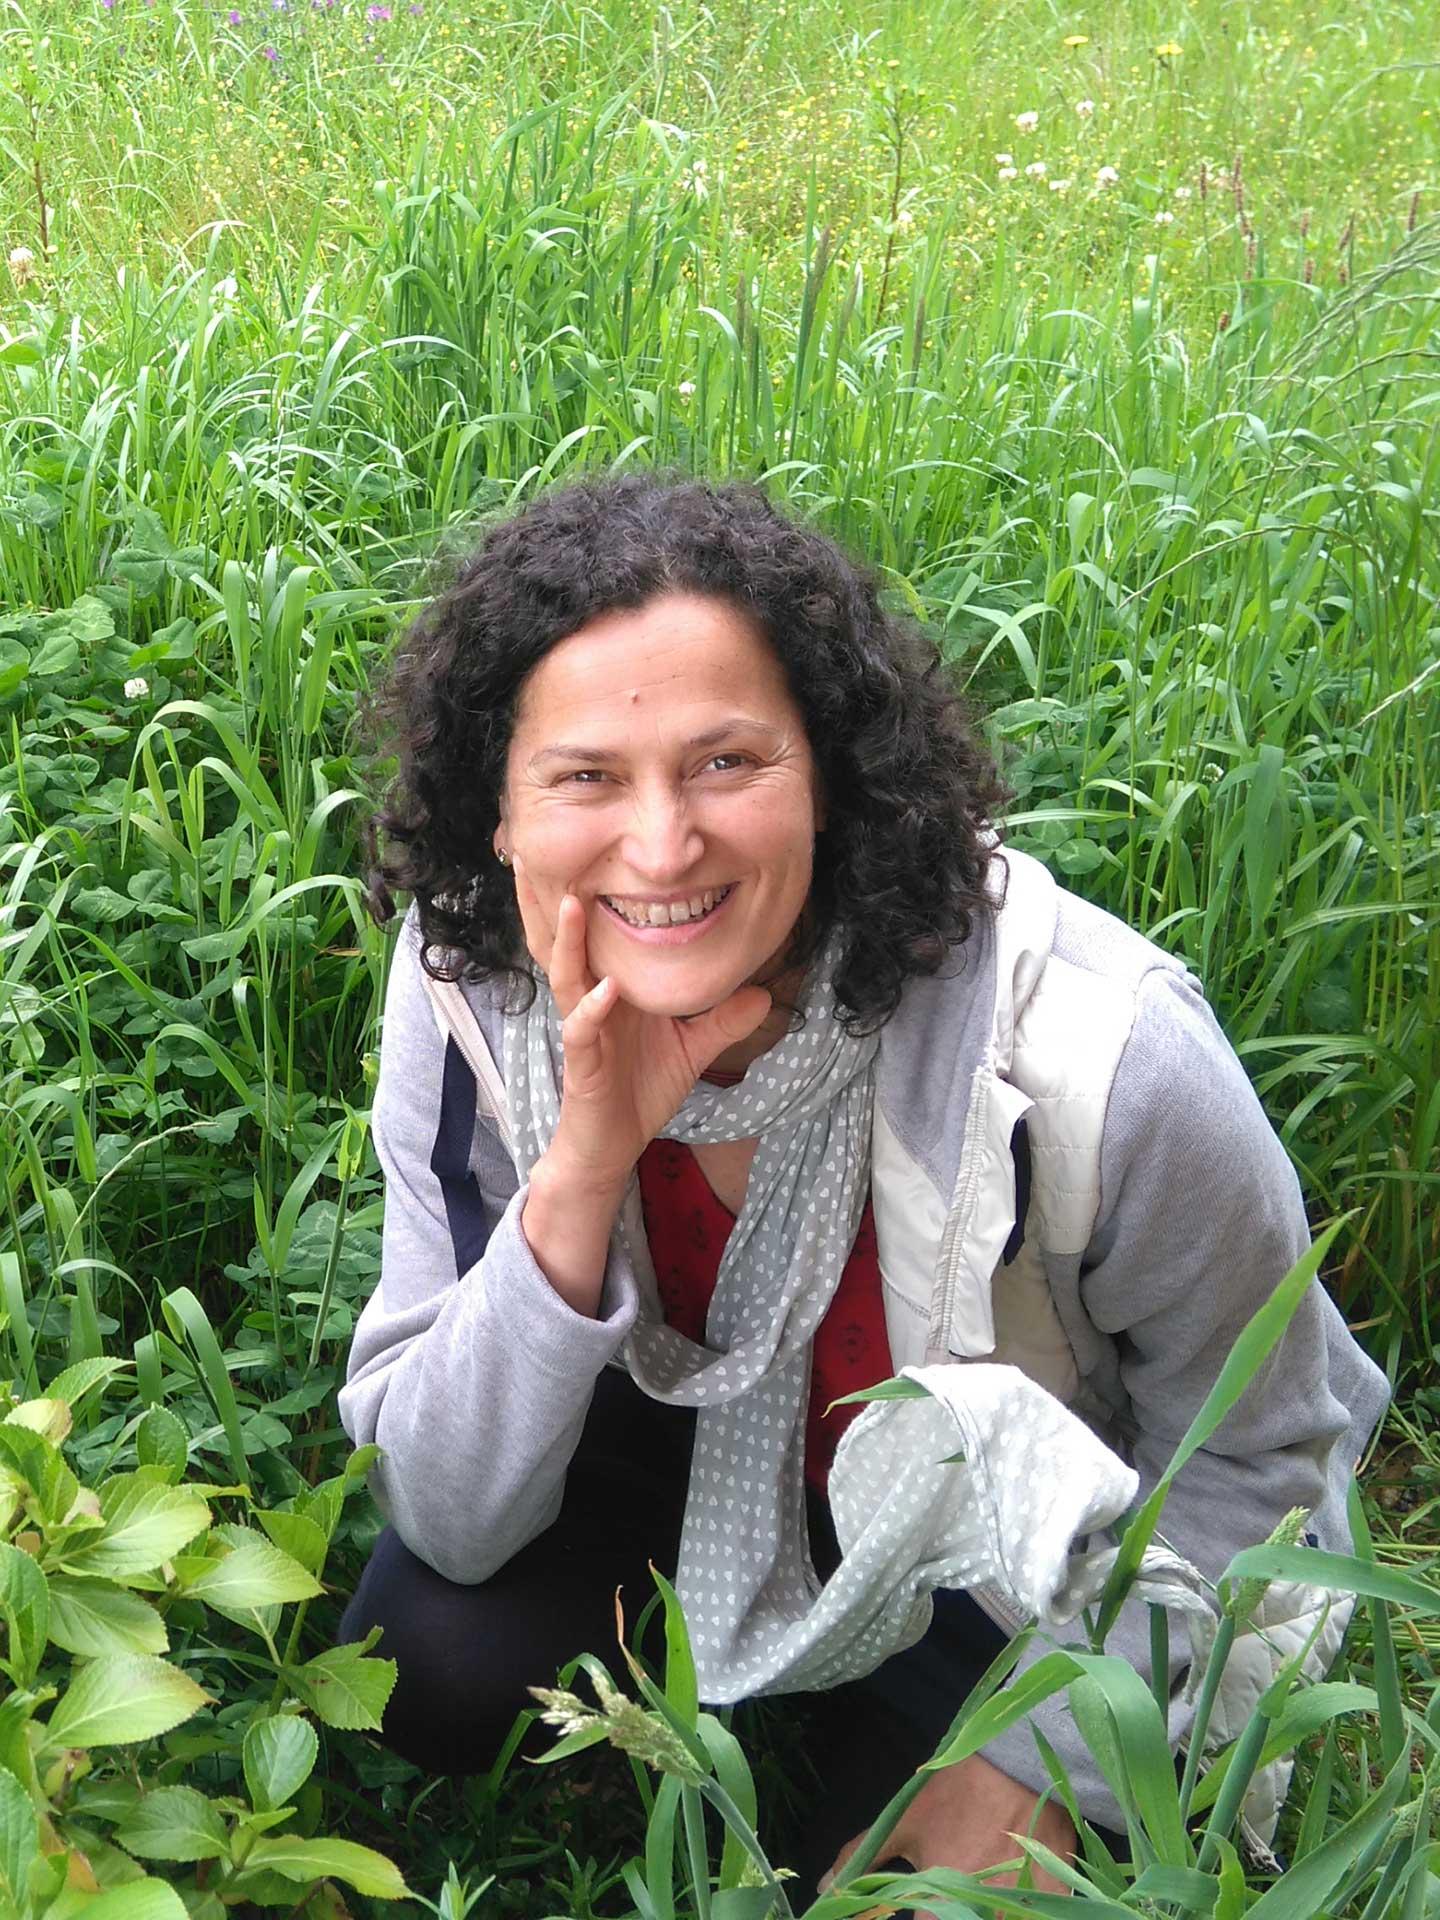 Raquel Flores, profesora de mindfulness y yoga